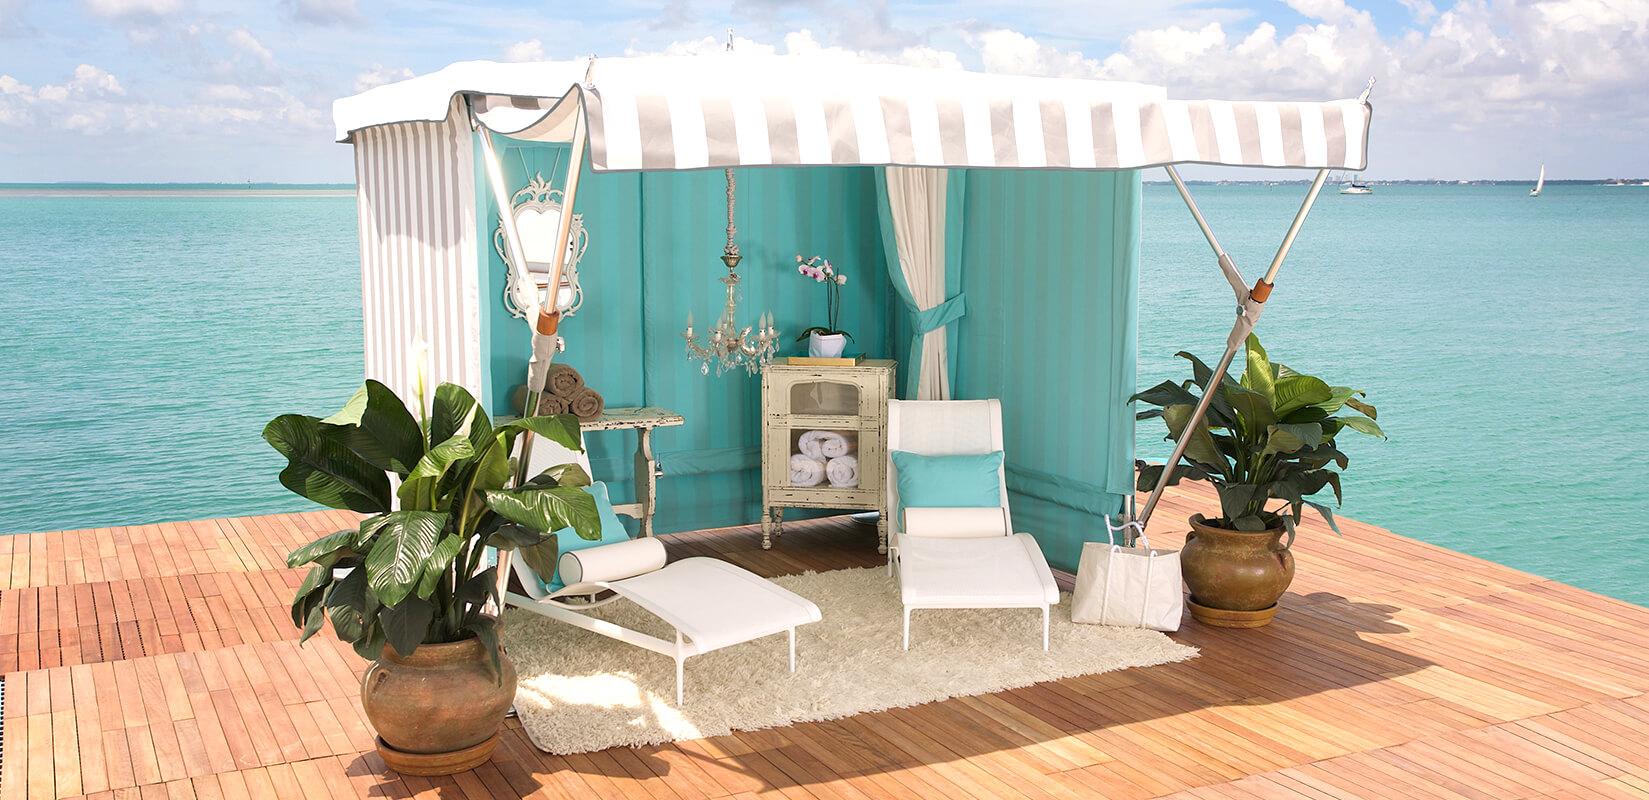 St. Tropez Outdoor Cabanas | TUUCI